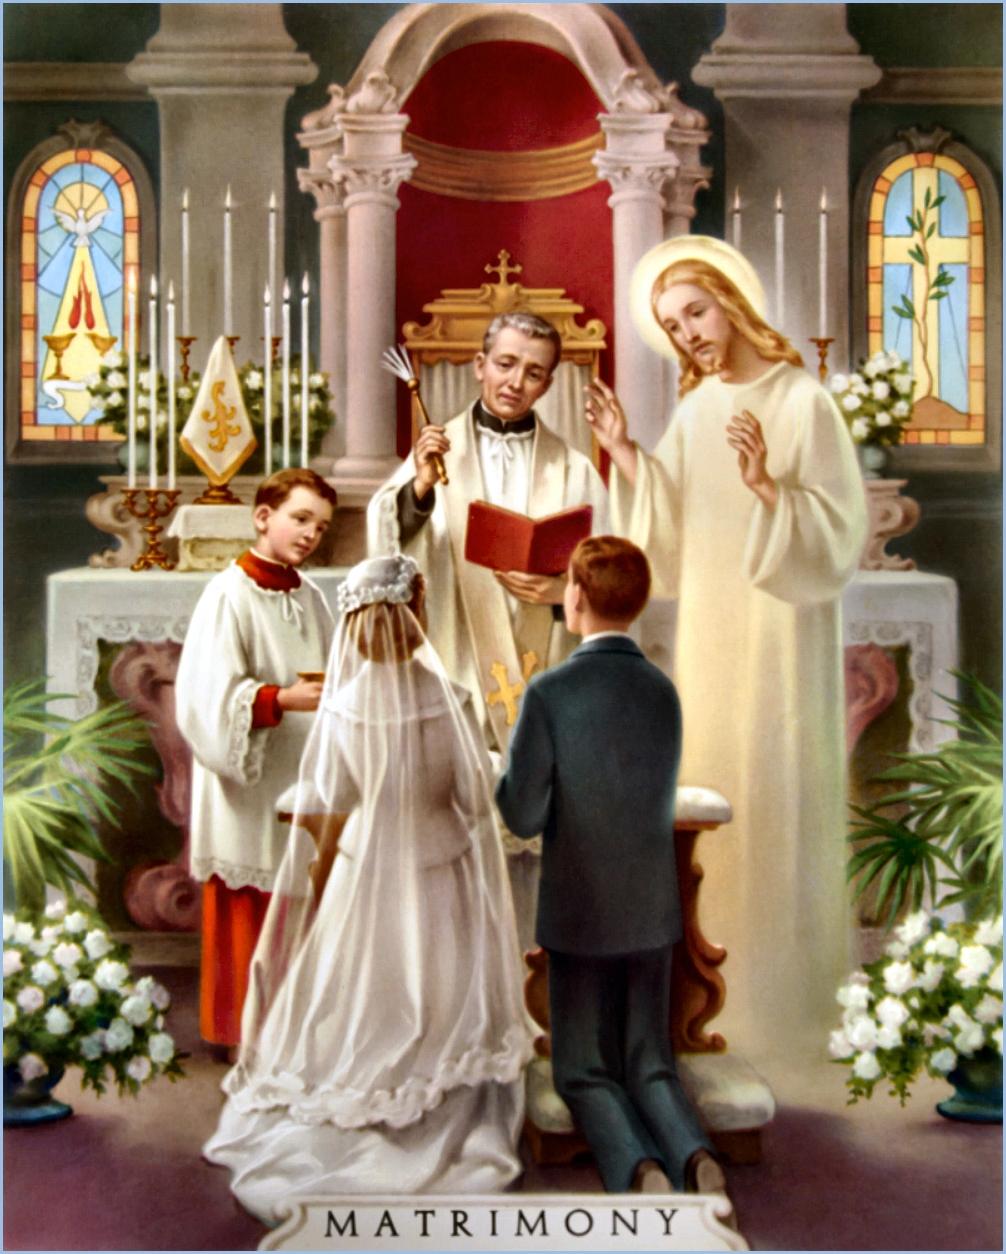 Matrimonio Catolico Y Ateo : Miles christi el matrimonio instituciÓn establecida por dios